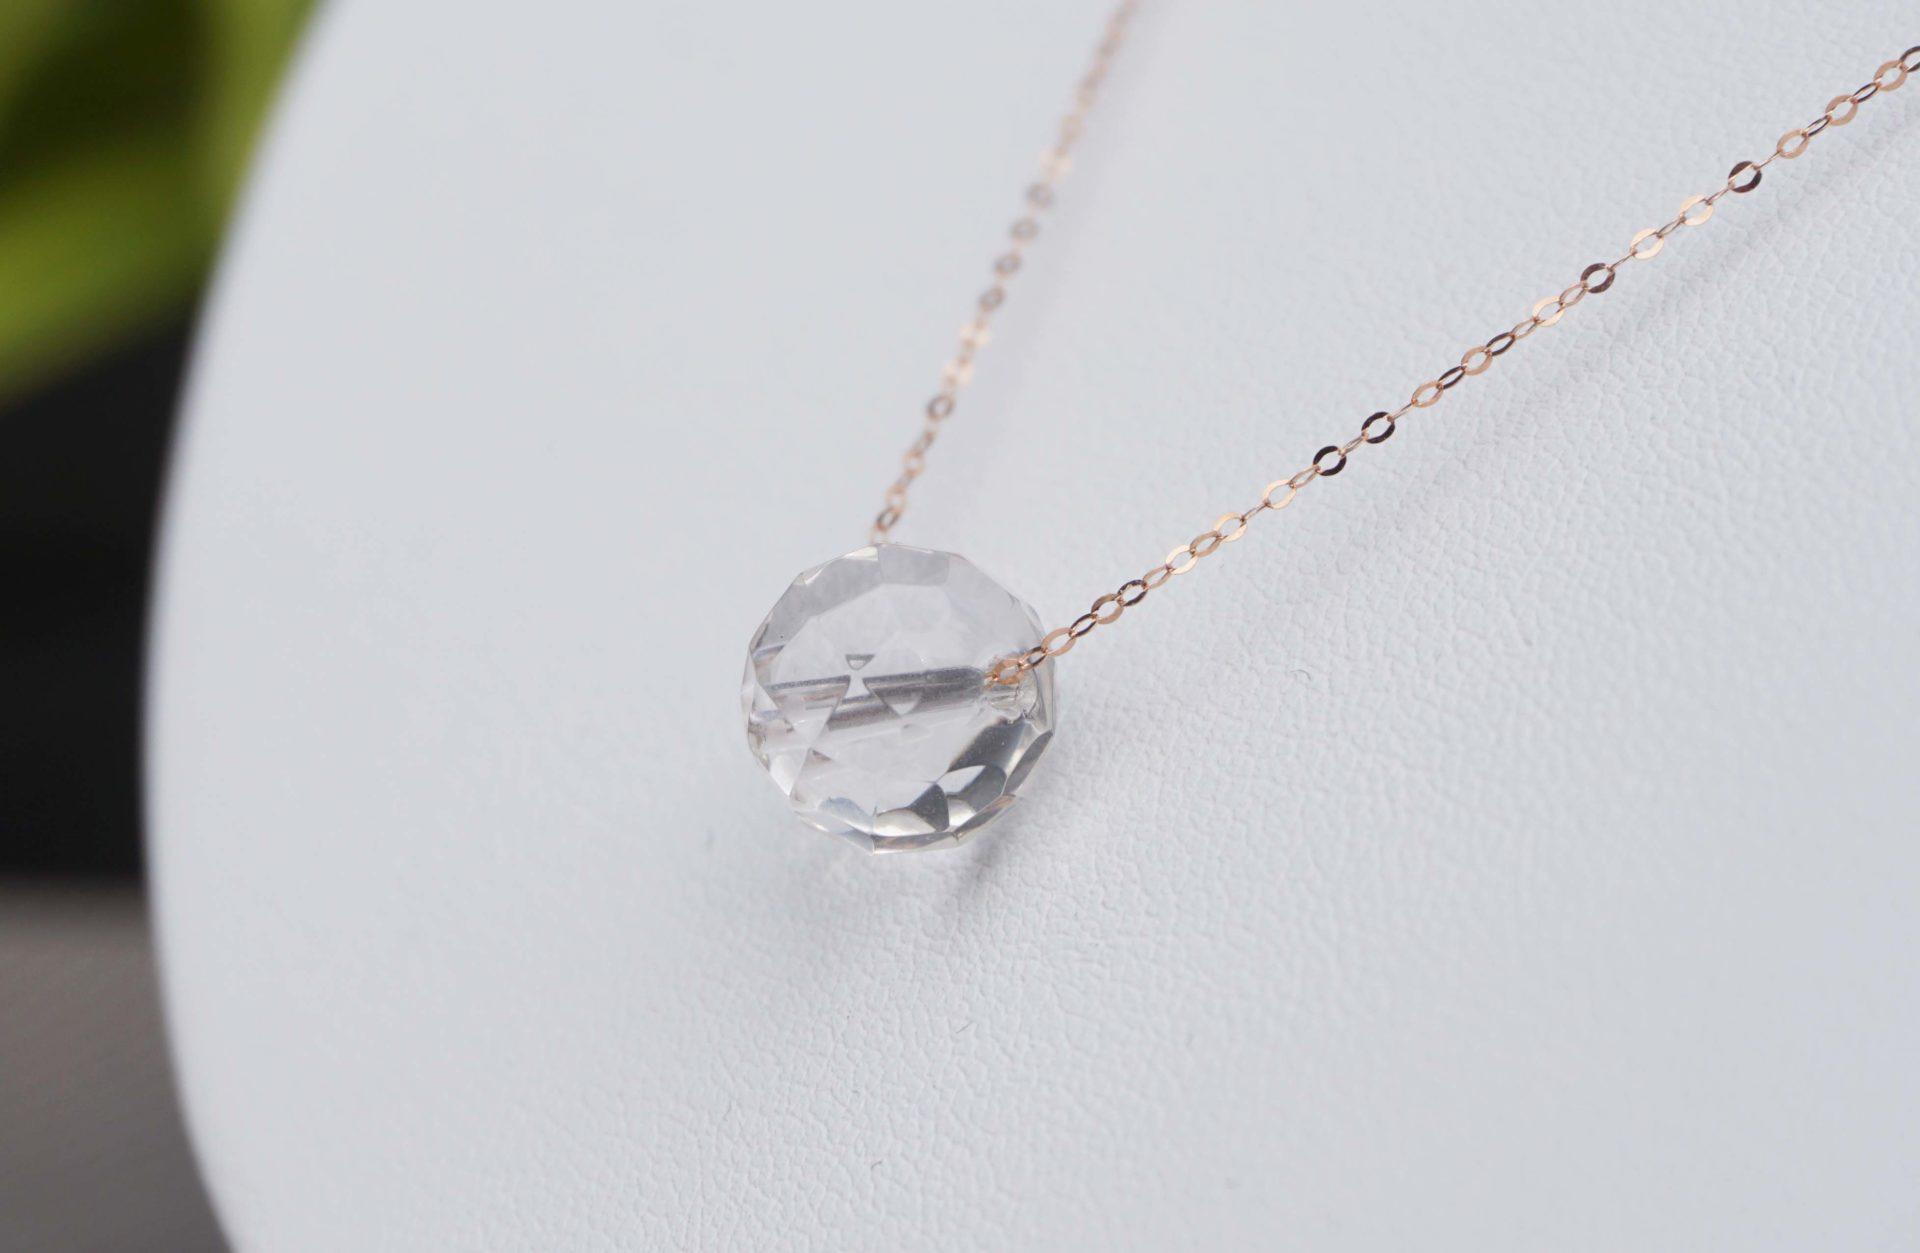 k-18chain01-sentient-plasma-crystal